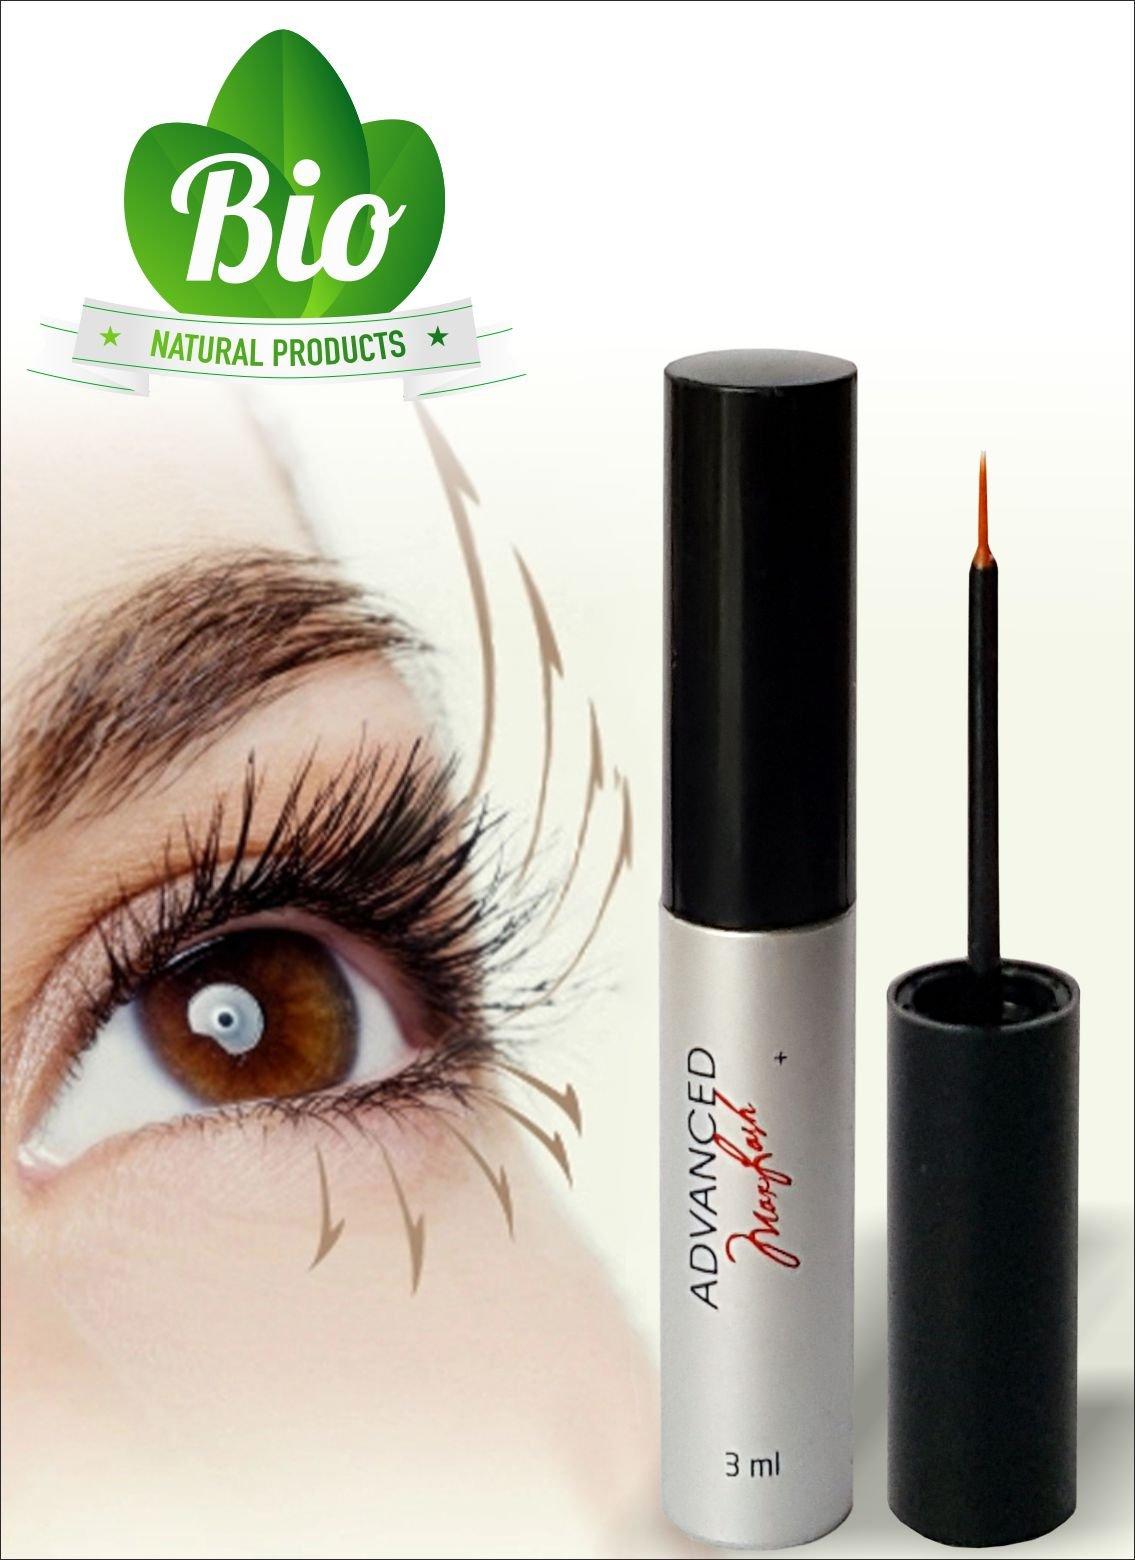 Amazon Lotus Eyelash Growth Serum Fda Approved 3ml Best Natural